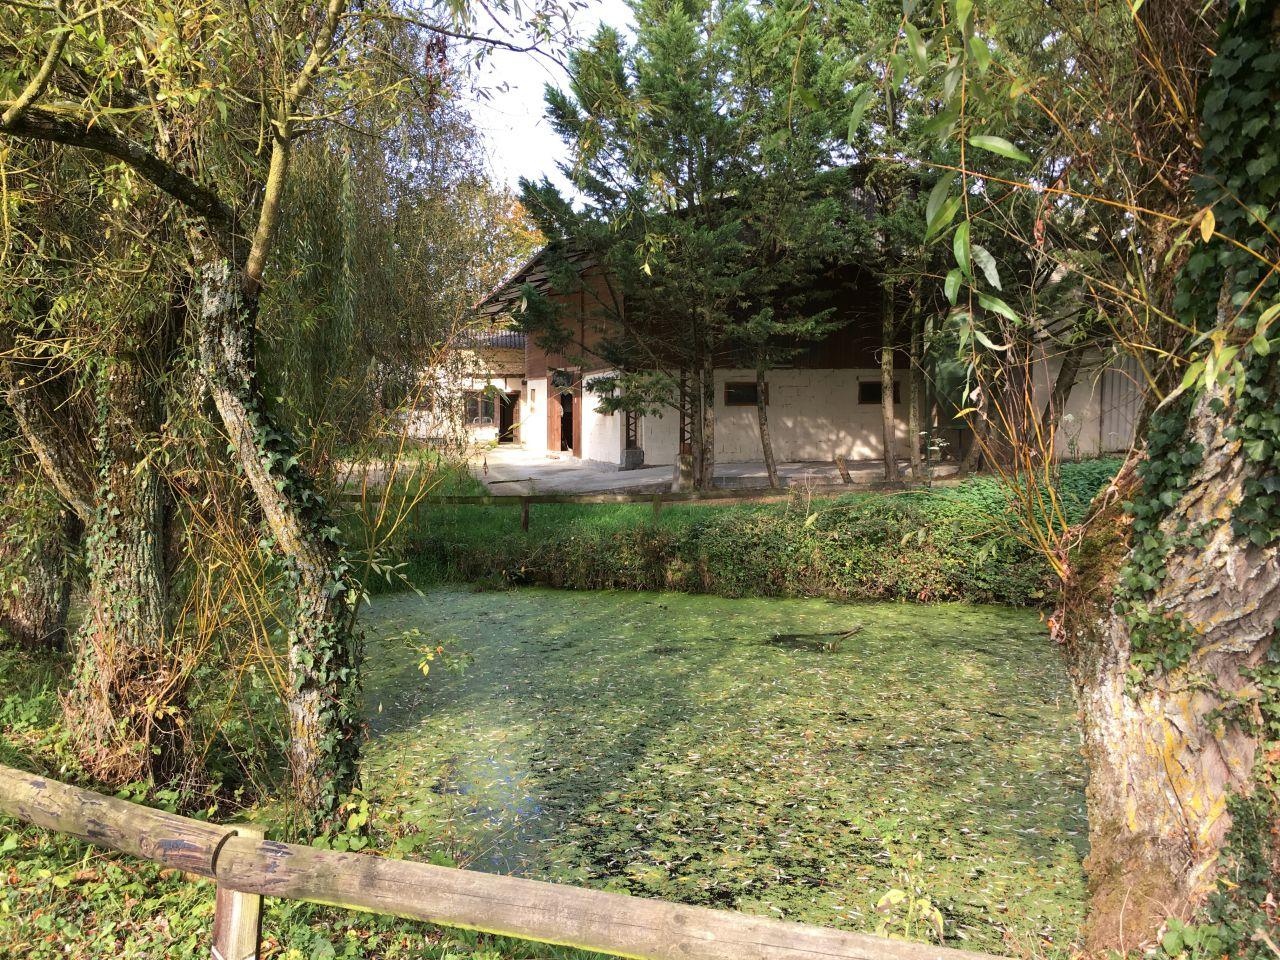 Sud orne centre equestre 382516 acheter cette - Centre equestre jardin acclimatation ...